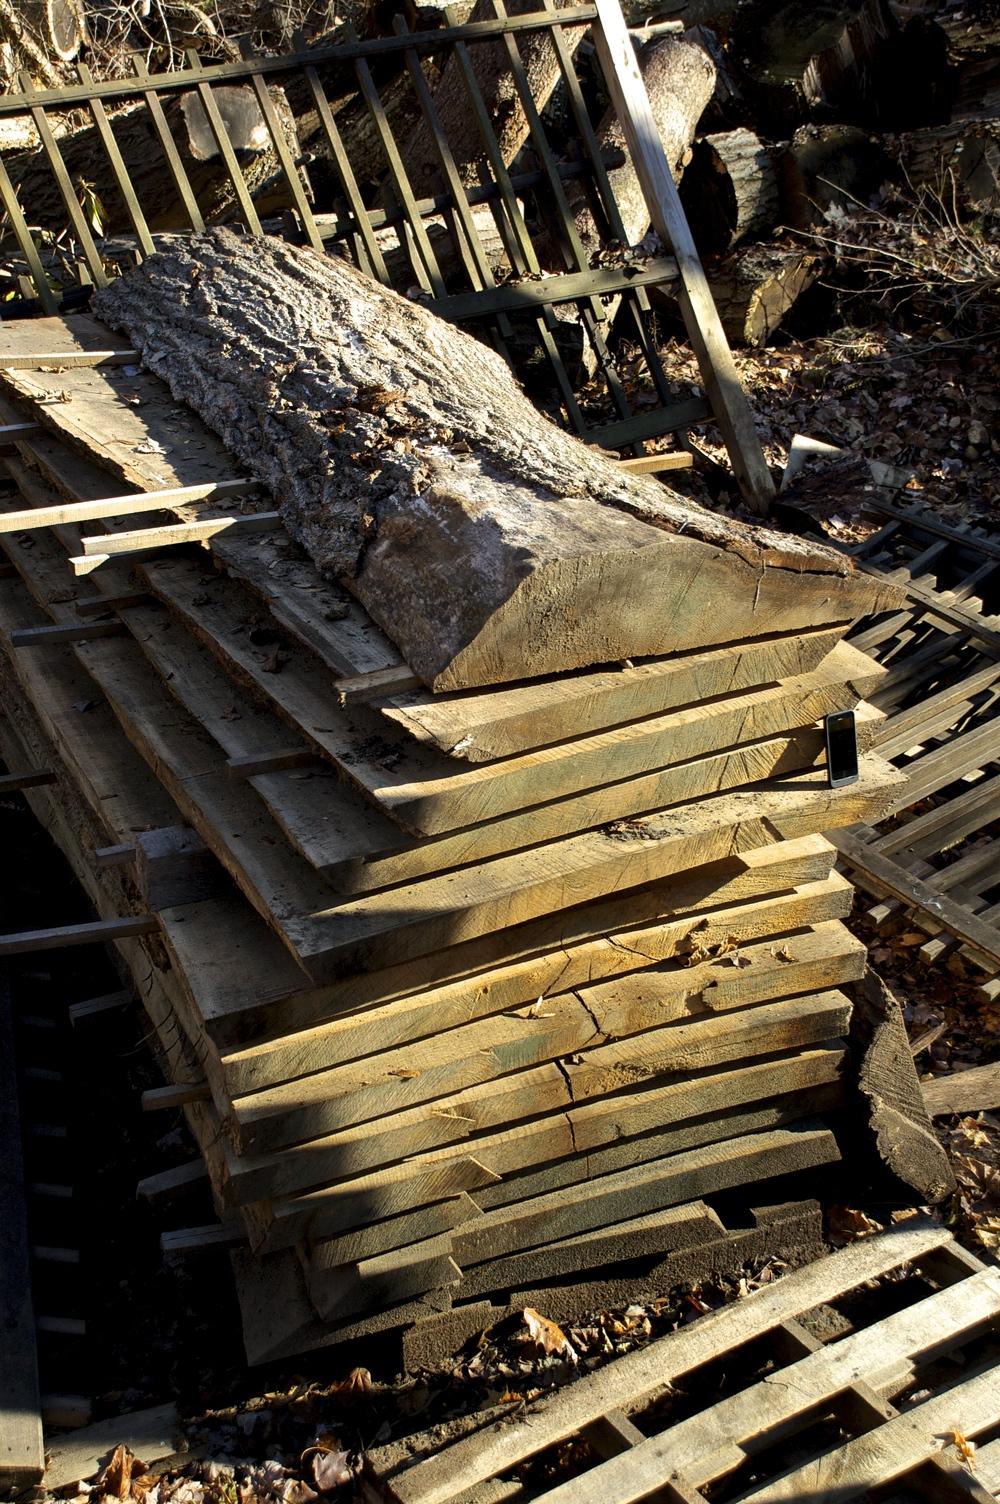 Curing oak slabs